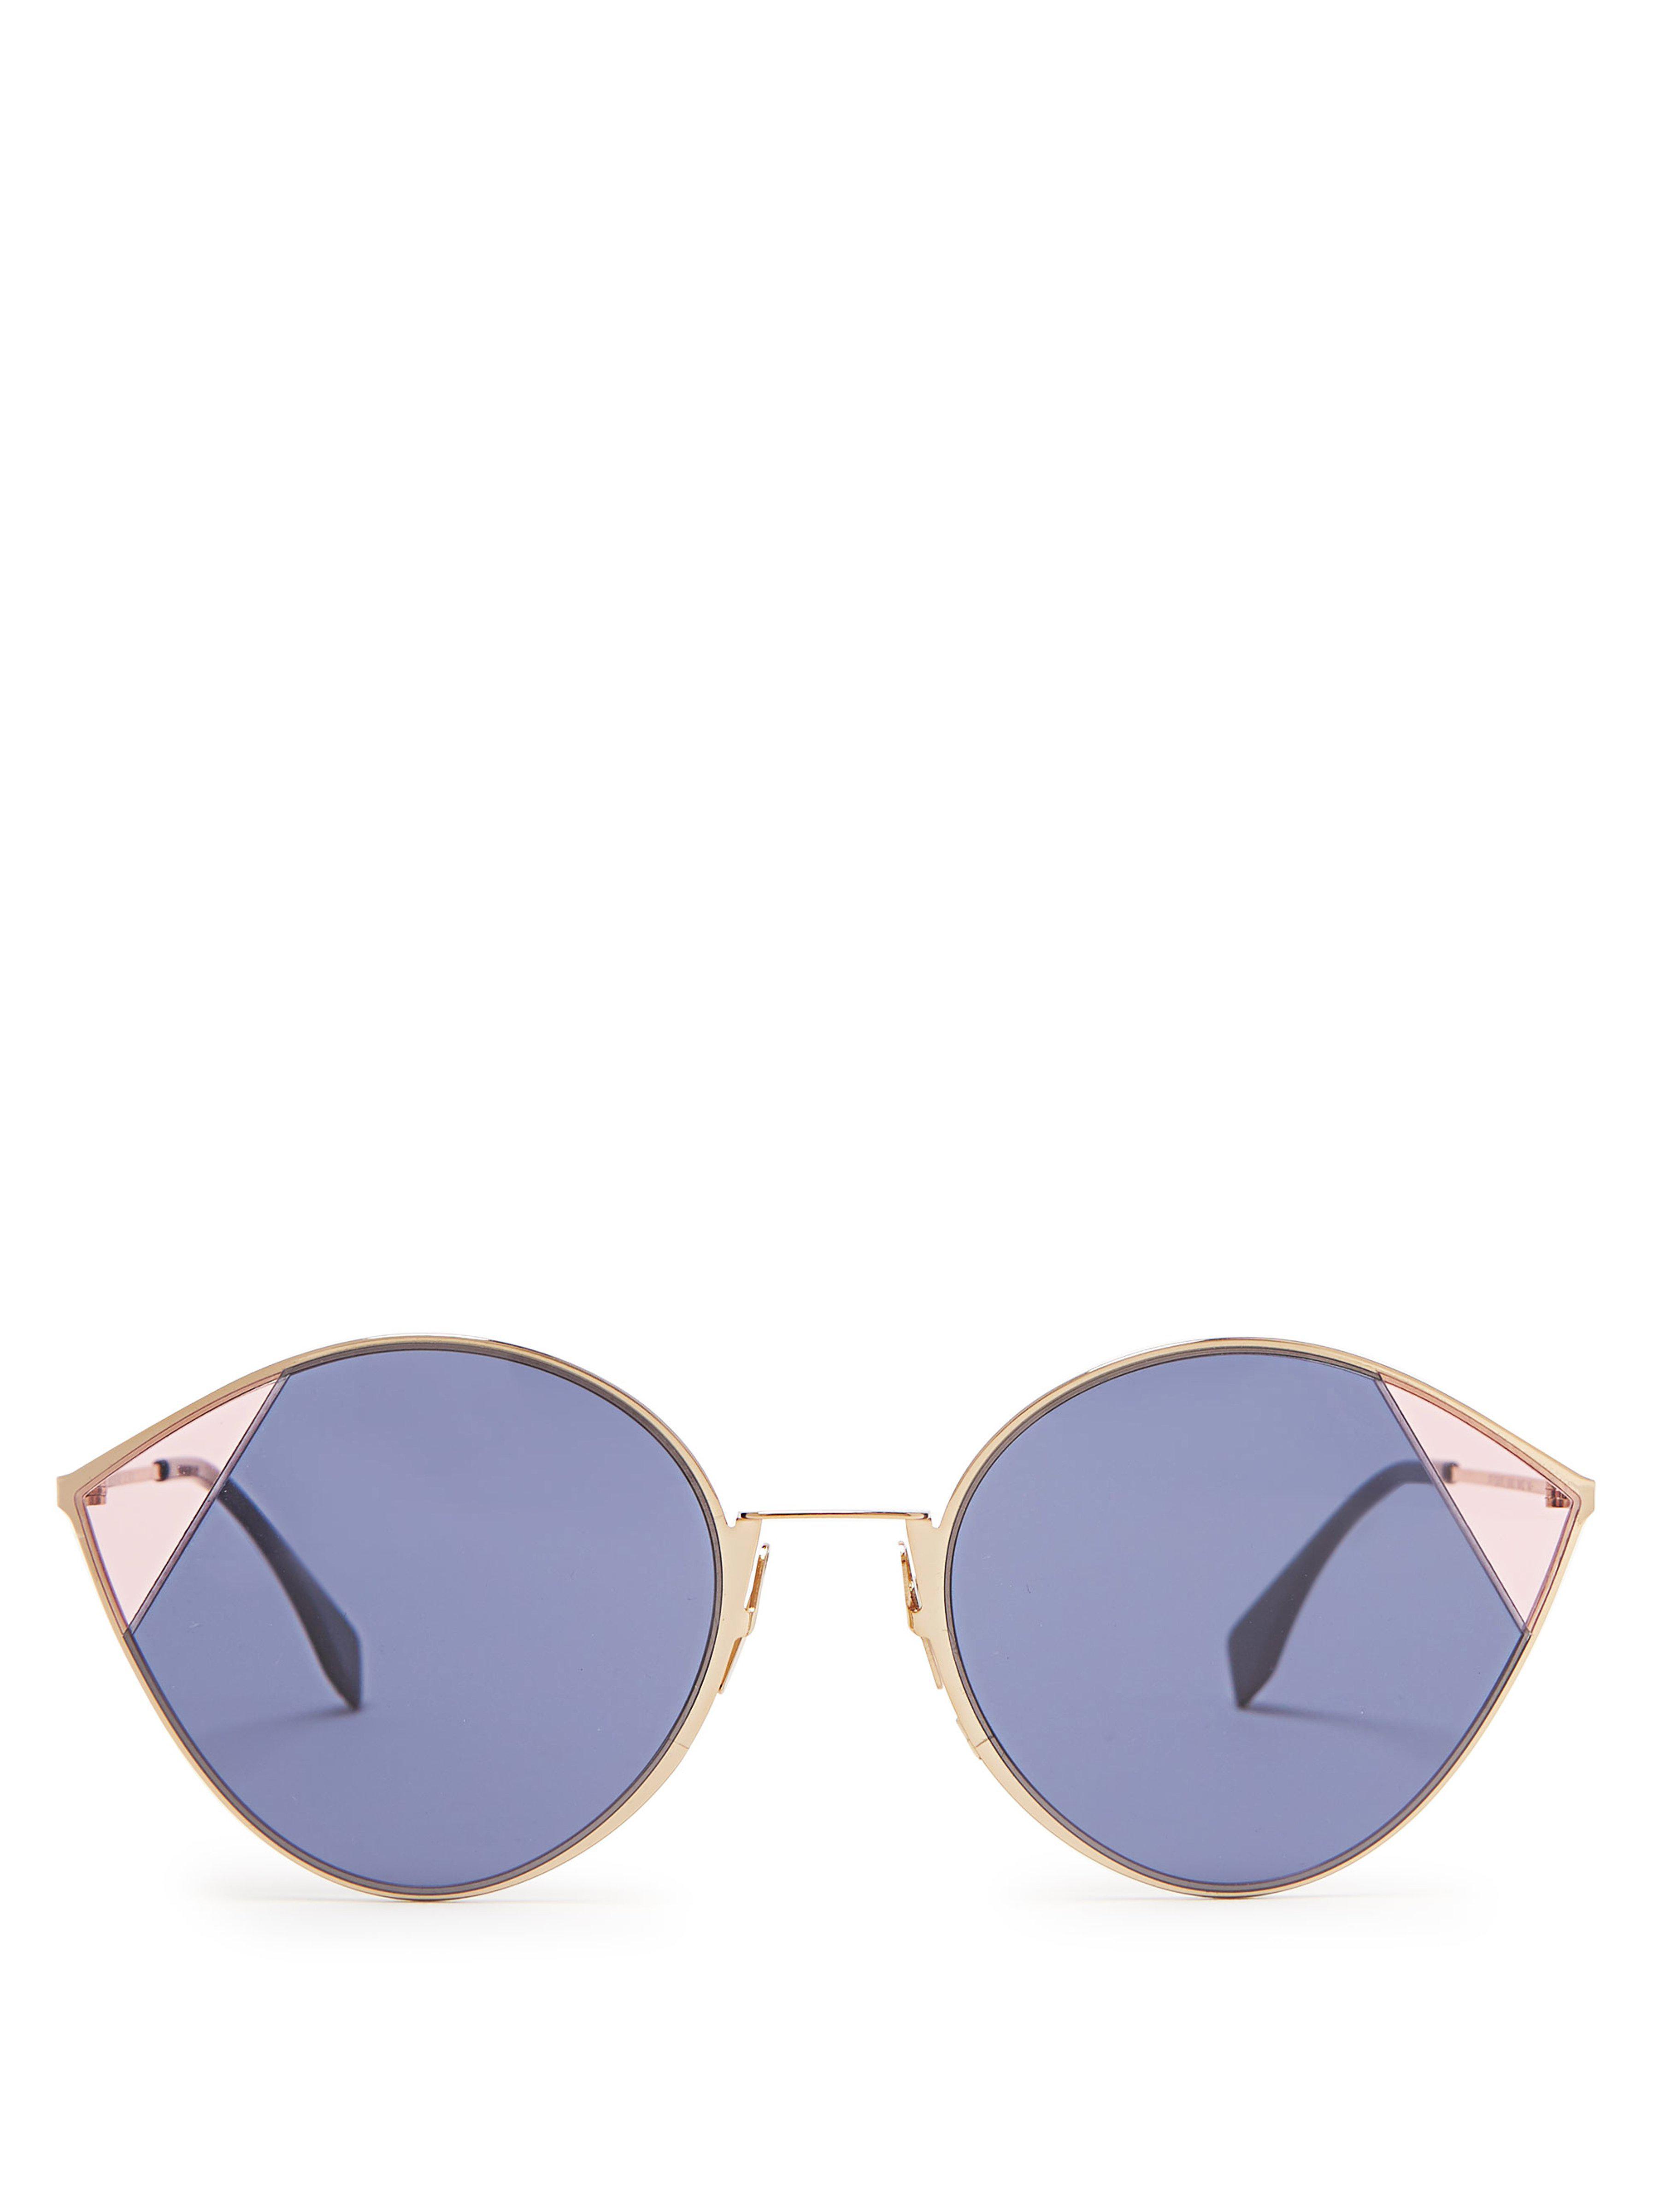 1333bc9c1792 Fendi Cat Eye Metal Sunglasses in Blue - Lyst